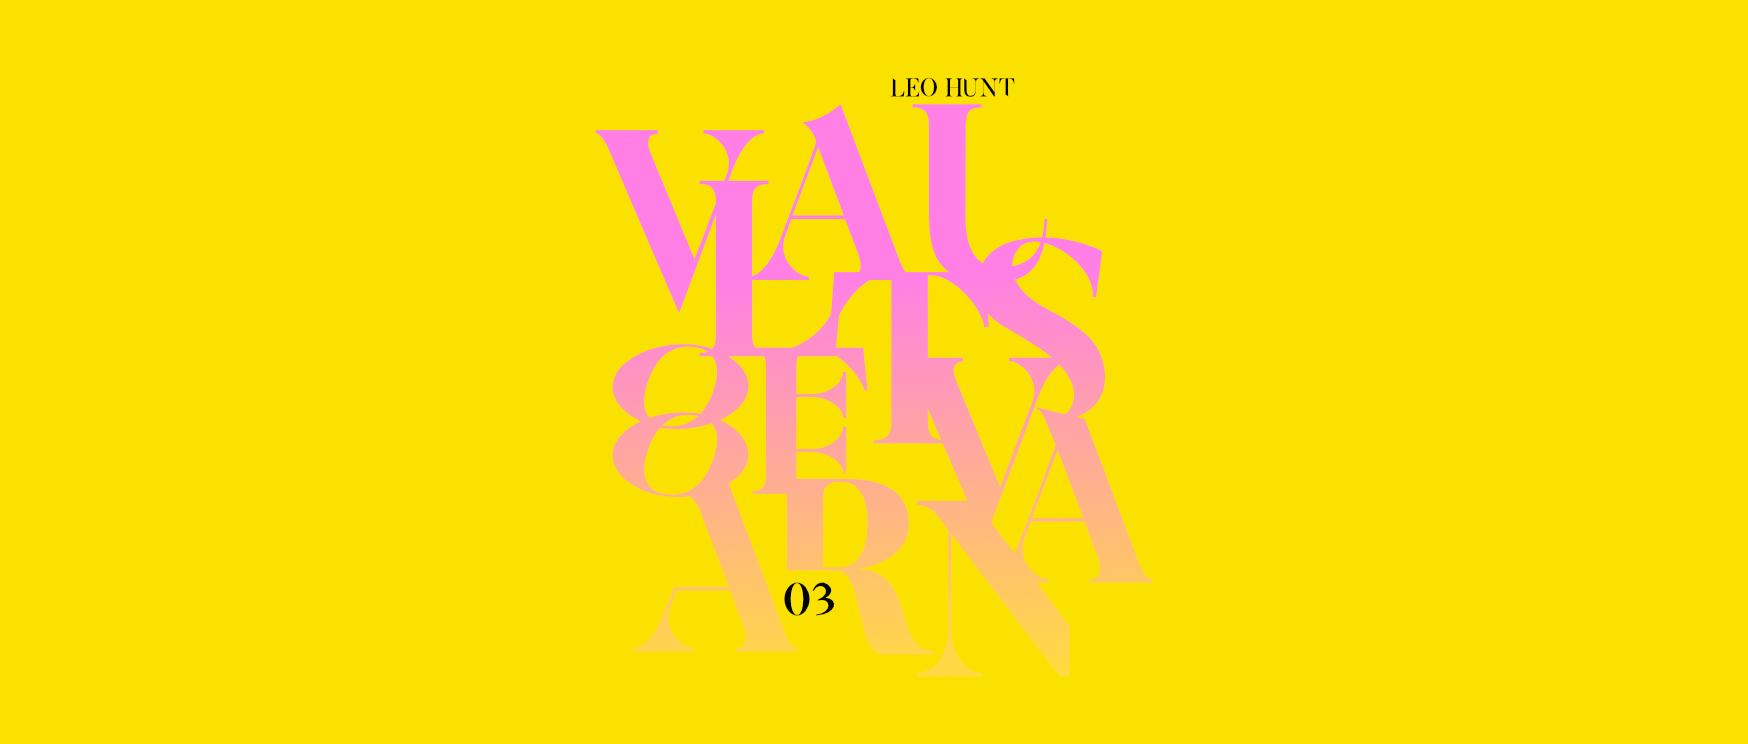 VAULTS OF VAARN #3